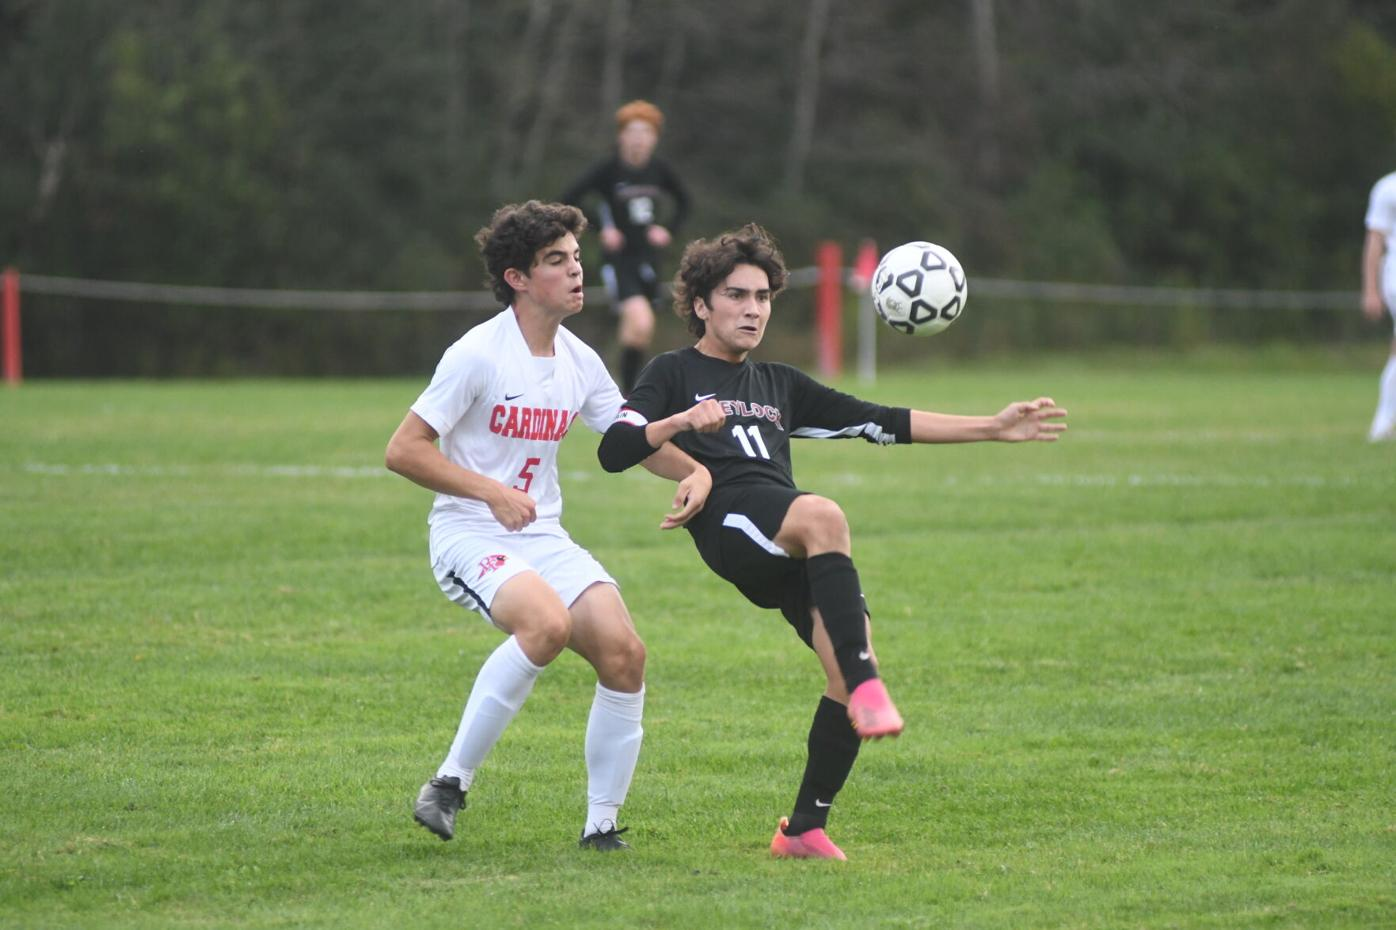 Diego Galvez kicks the ball